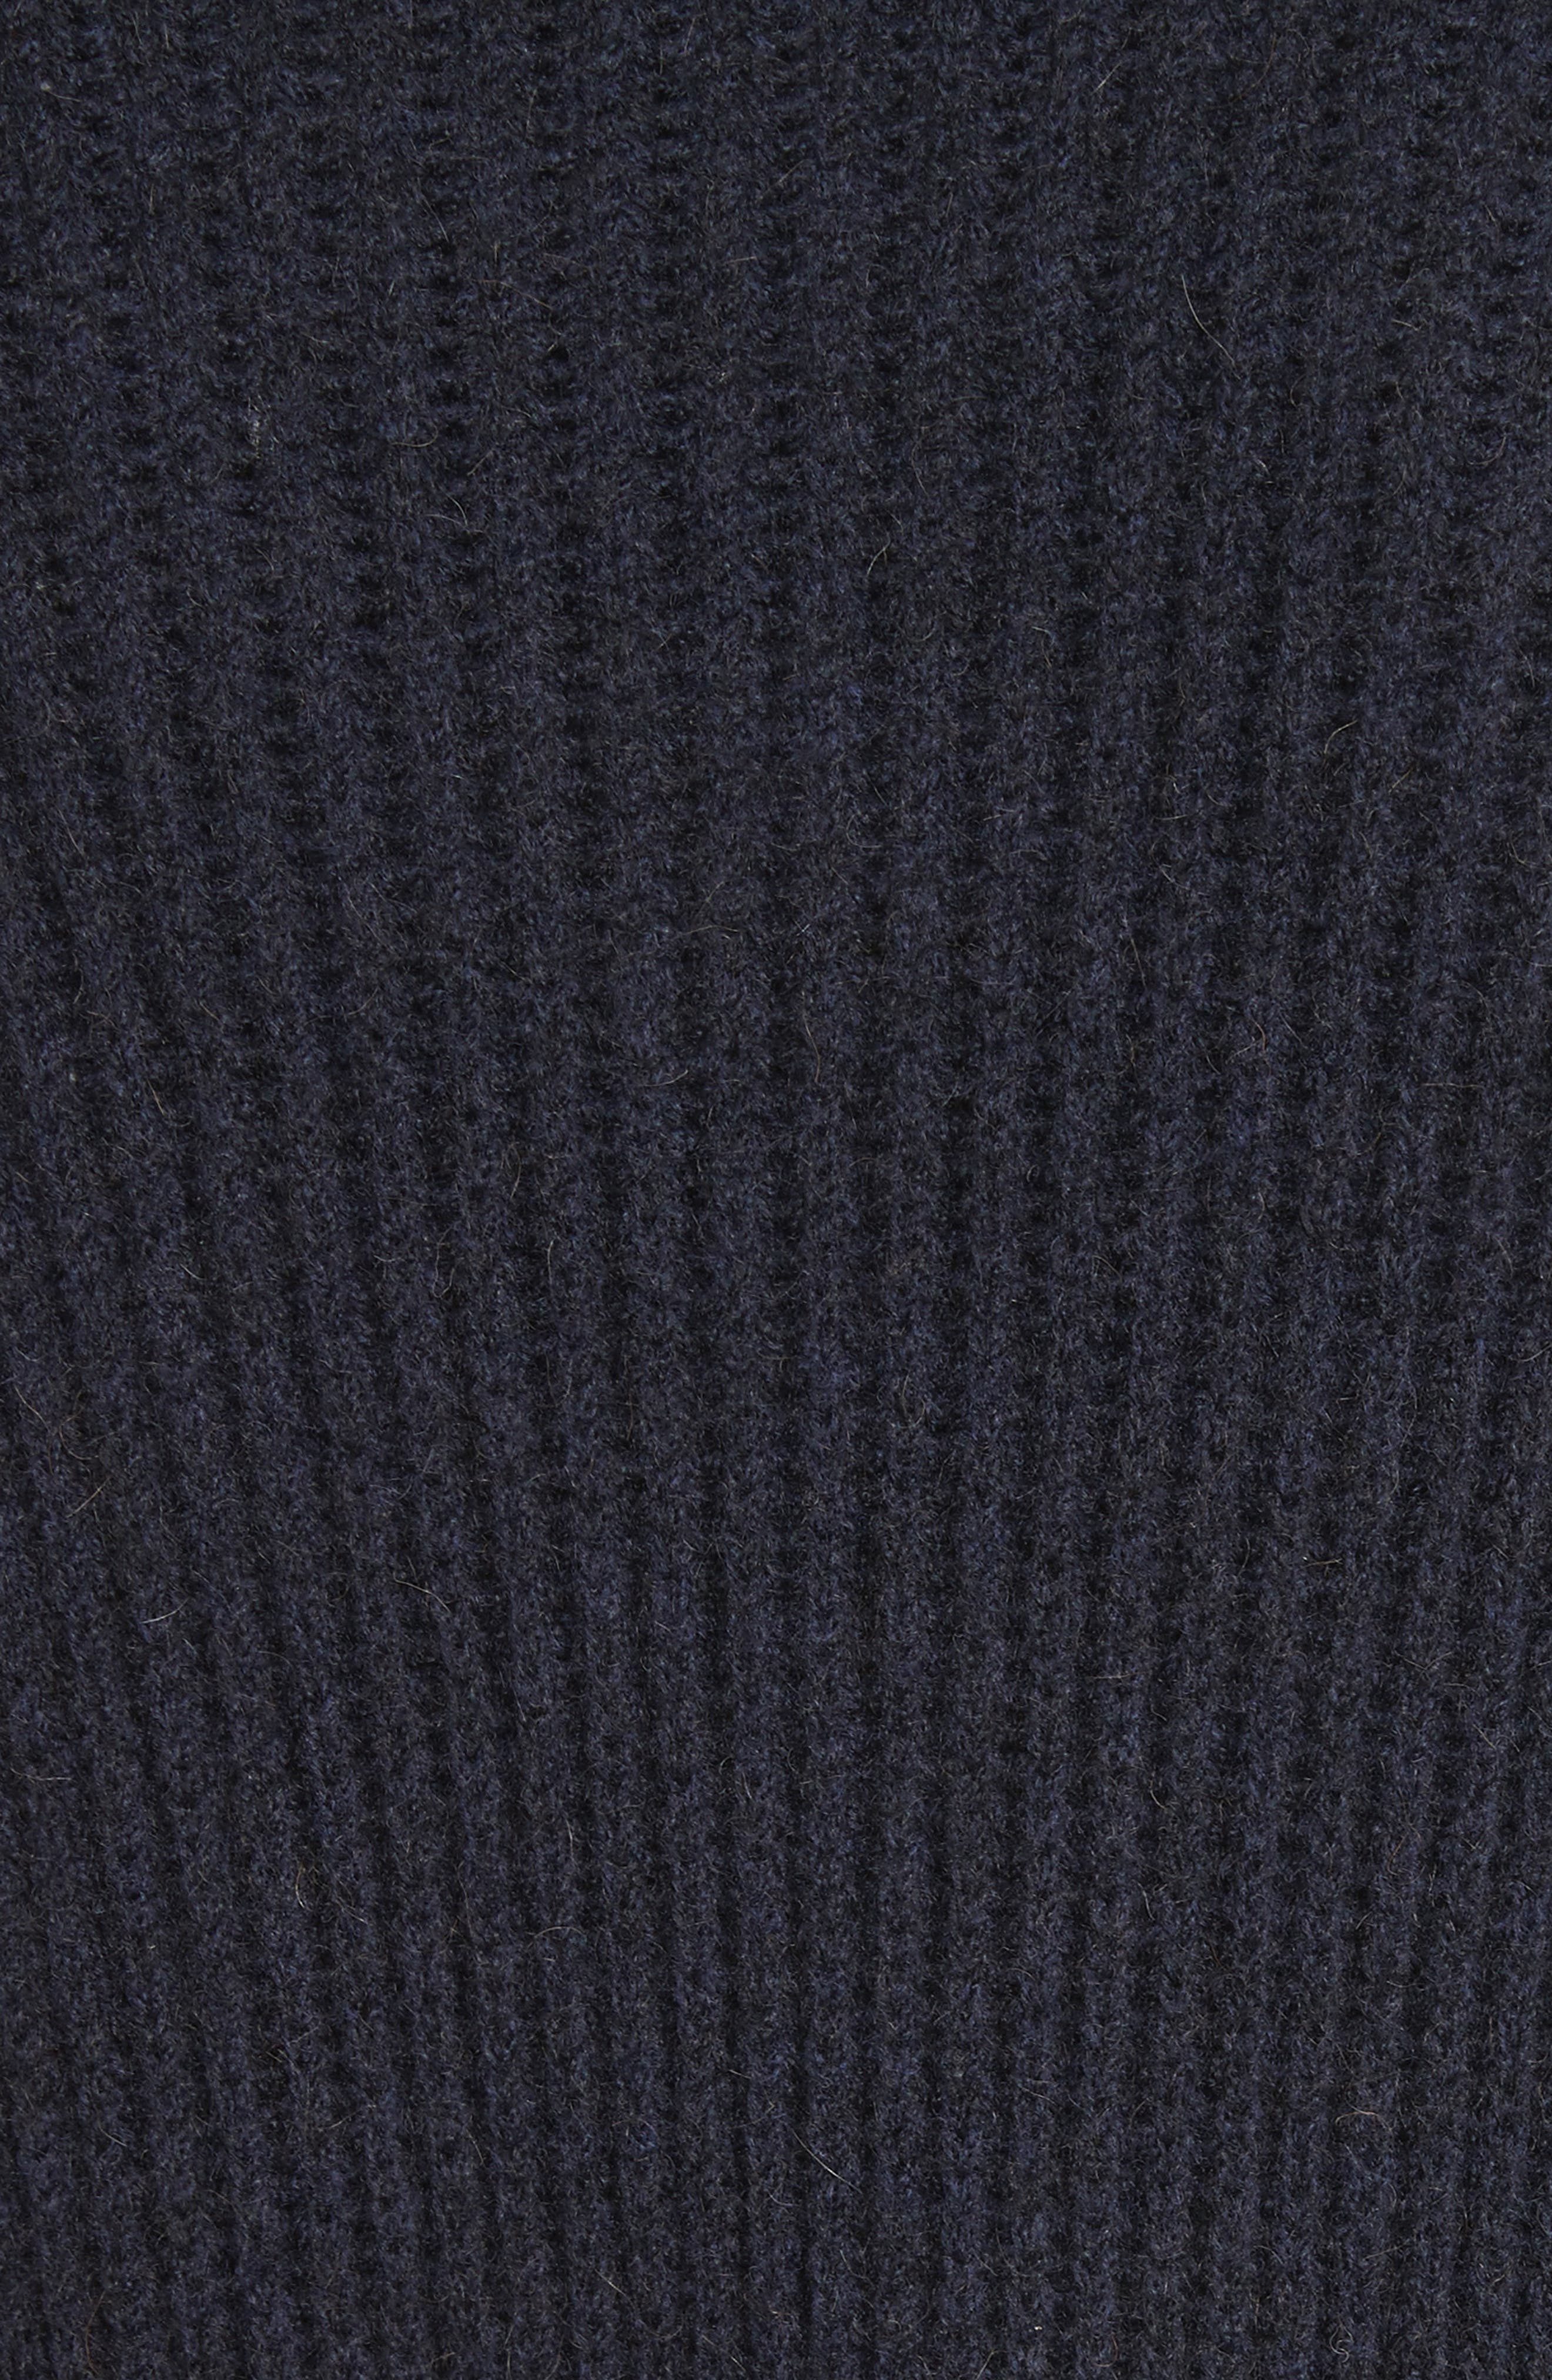 James Merino Wool Blend Cardigan,                             Alternate thumbnail 5, color,                             401